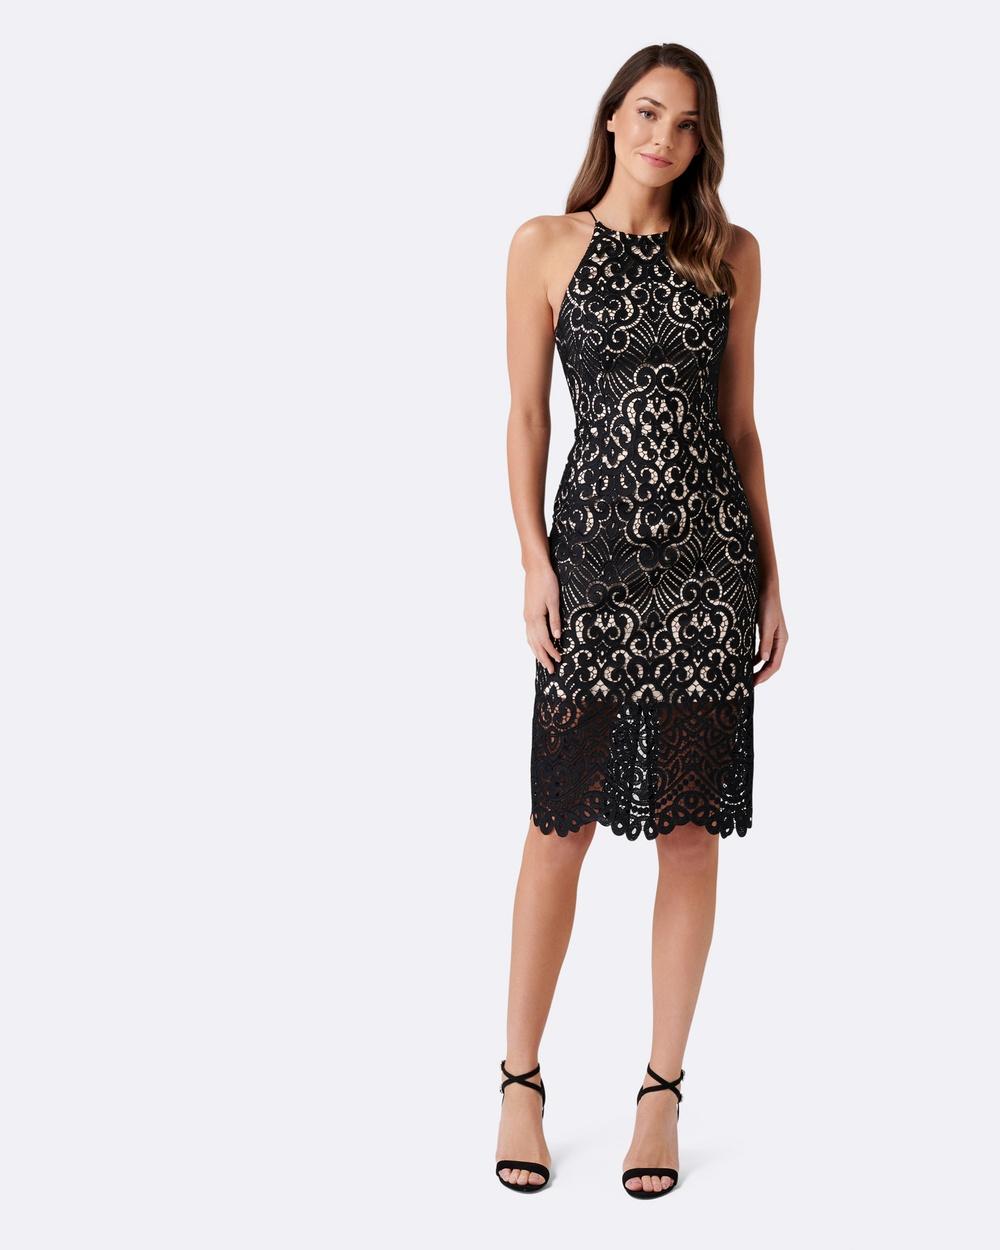 Forever New Debbie Lace Pencil Dress Bridesmaid Dresses Black Debbie Lace Pencil Dress